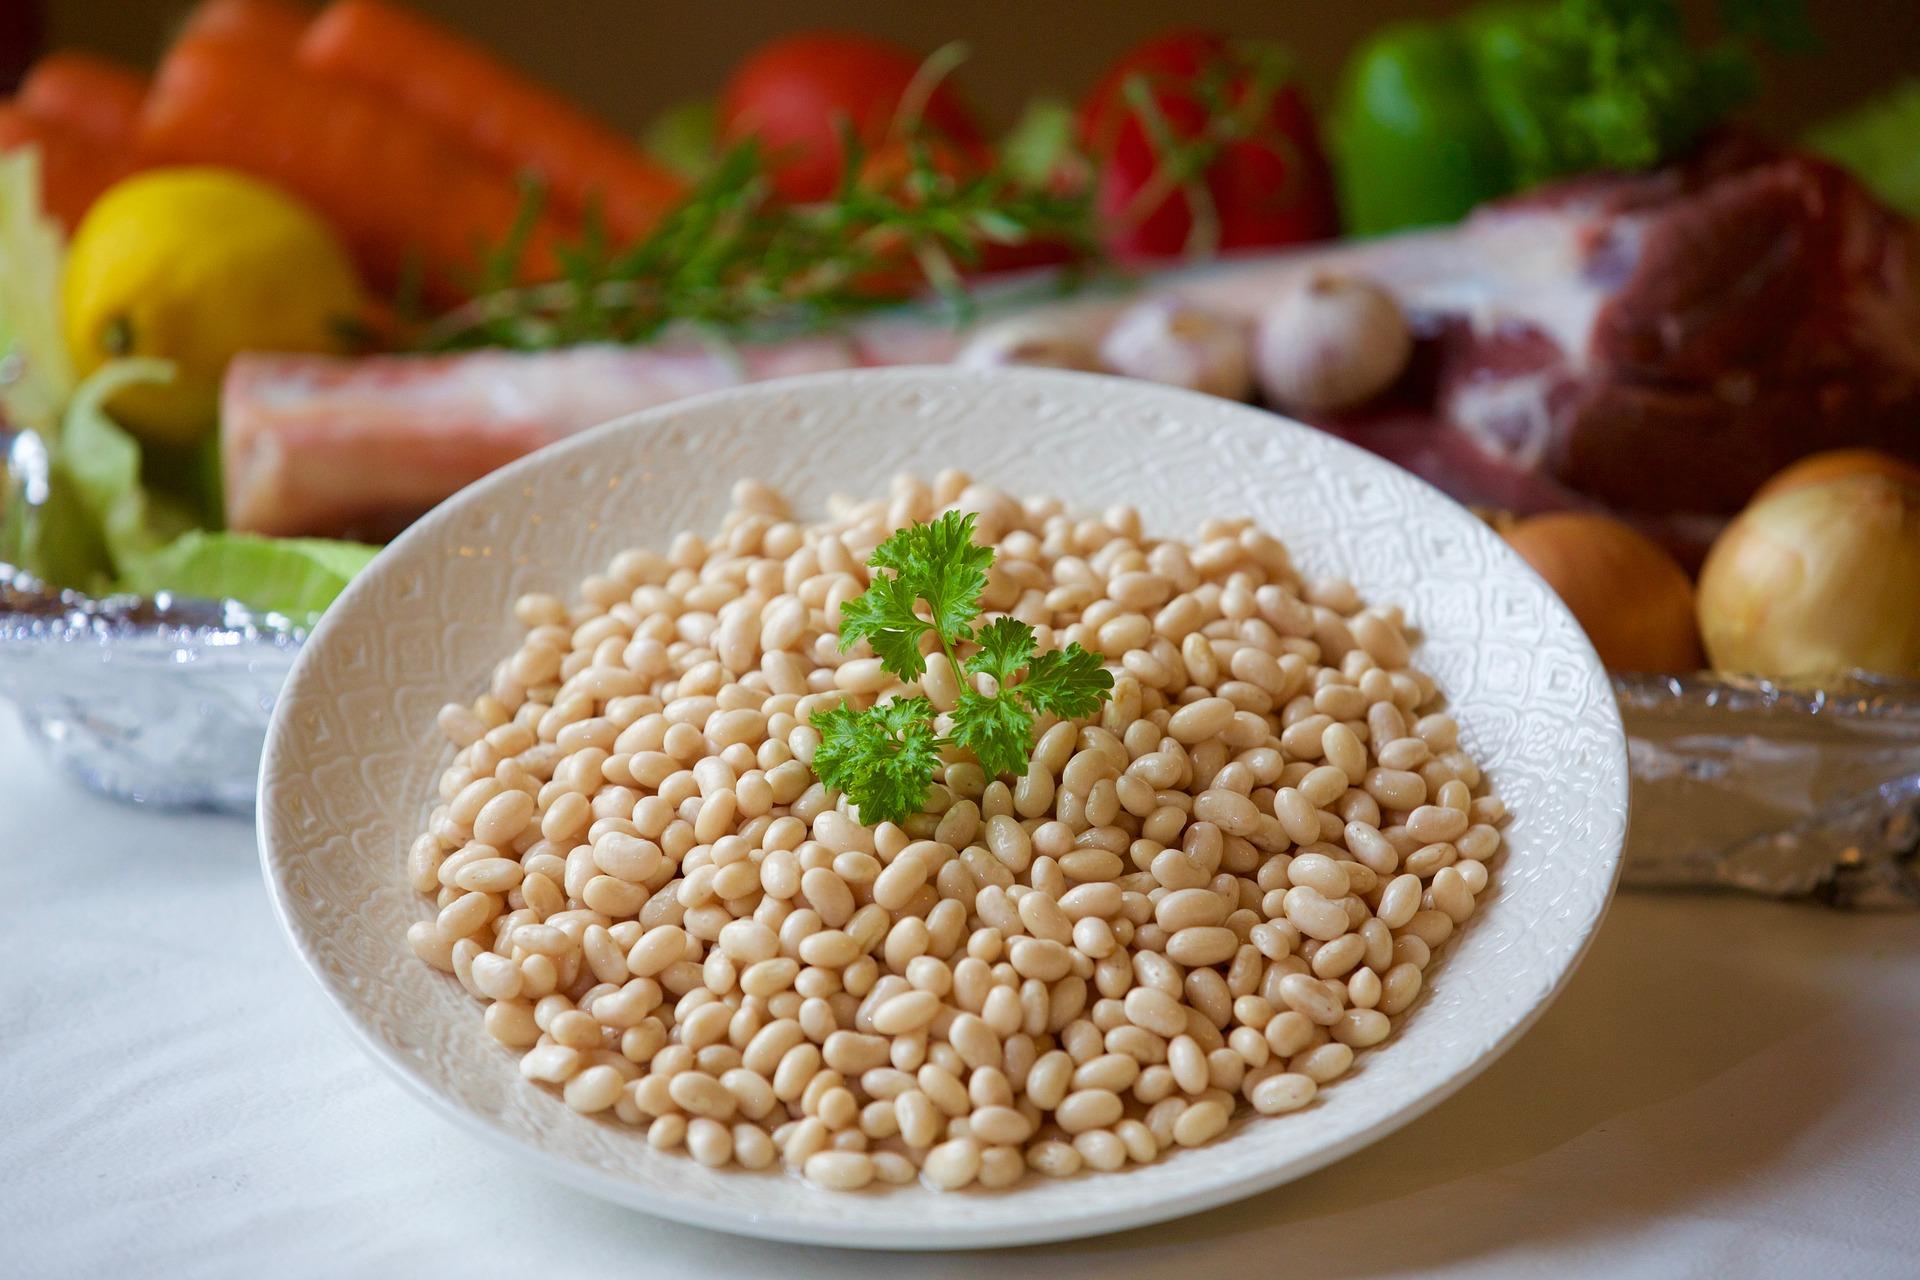 Cynk a dieta roślinna